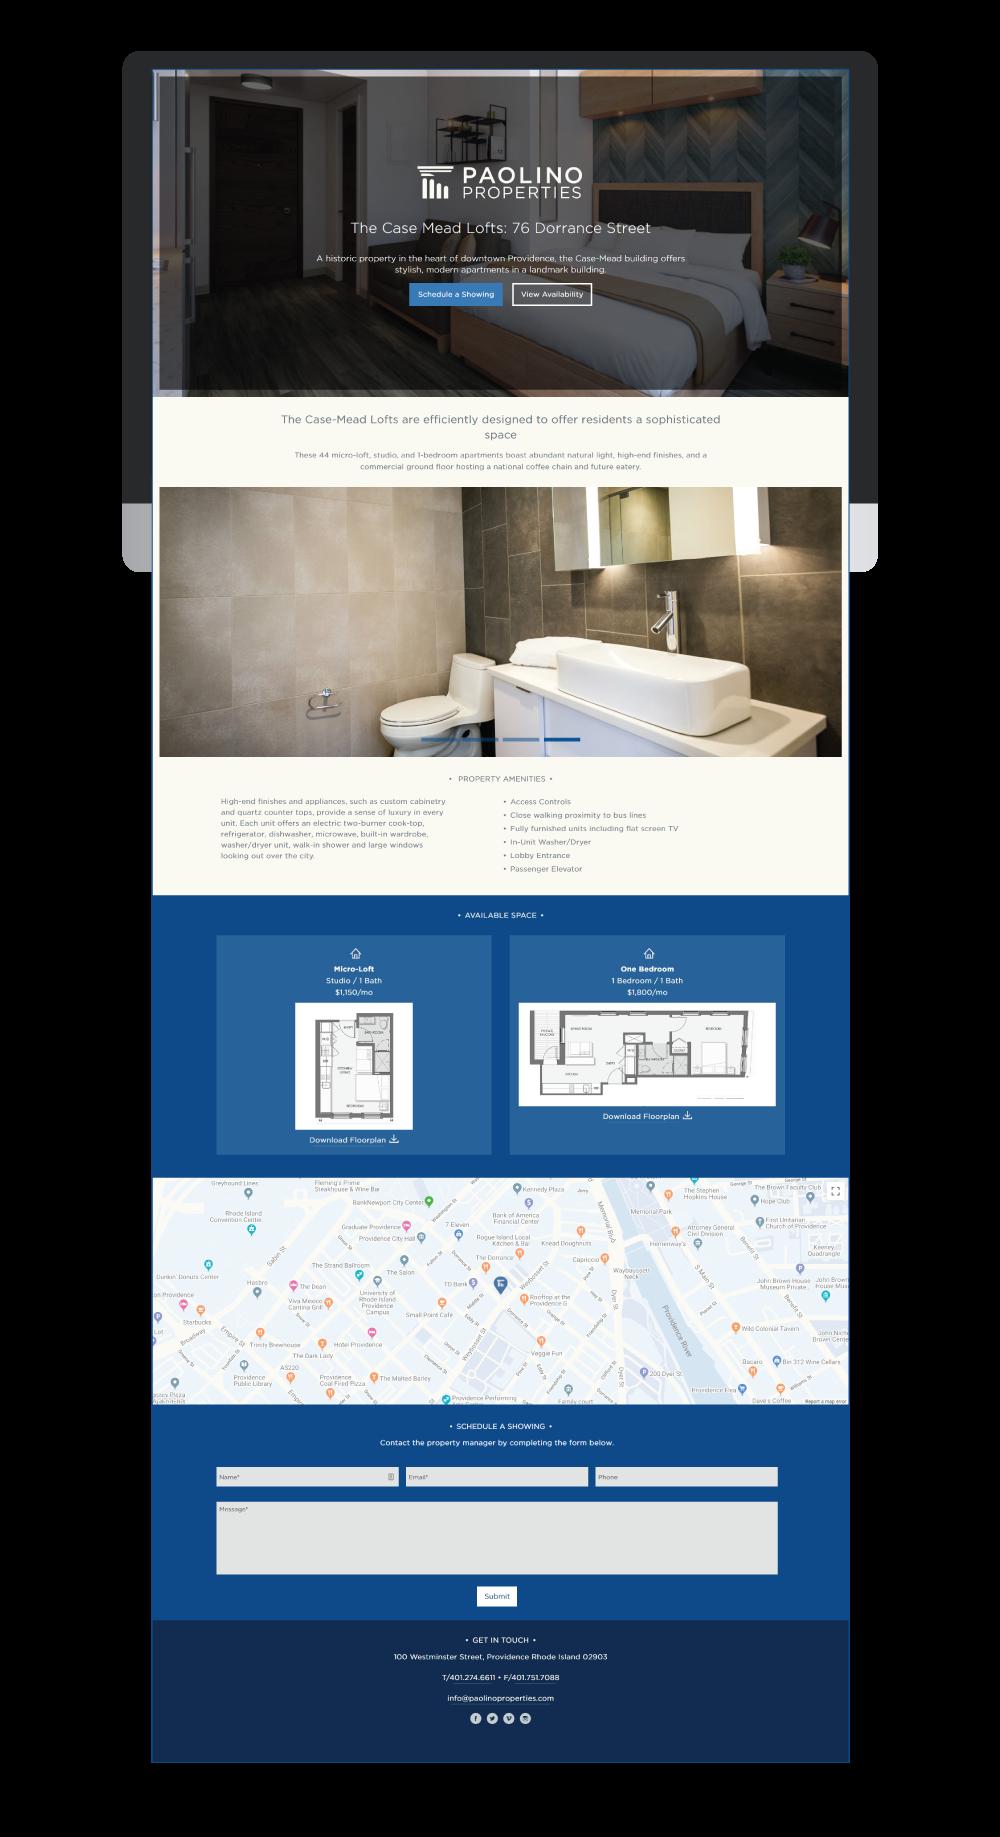 Case Mead Lofts Paolino Property Landing Page